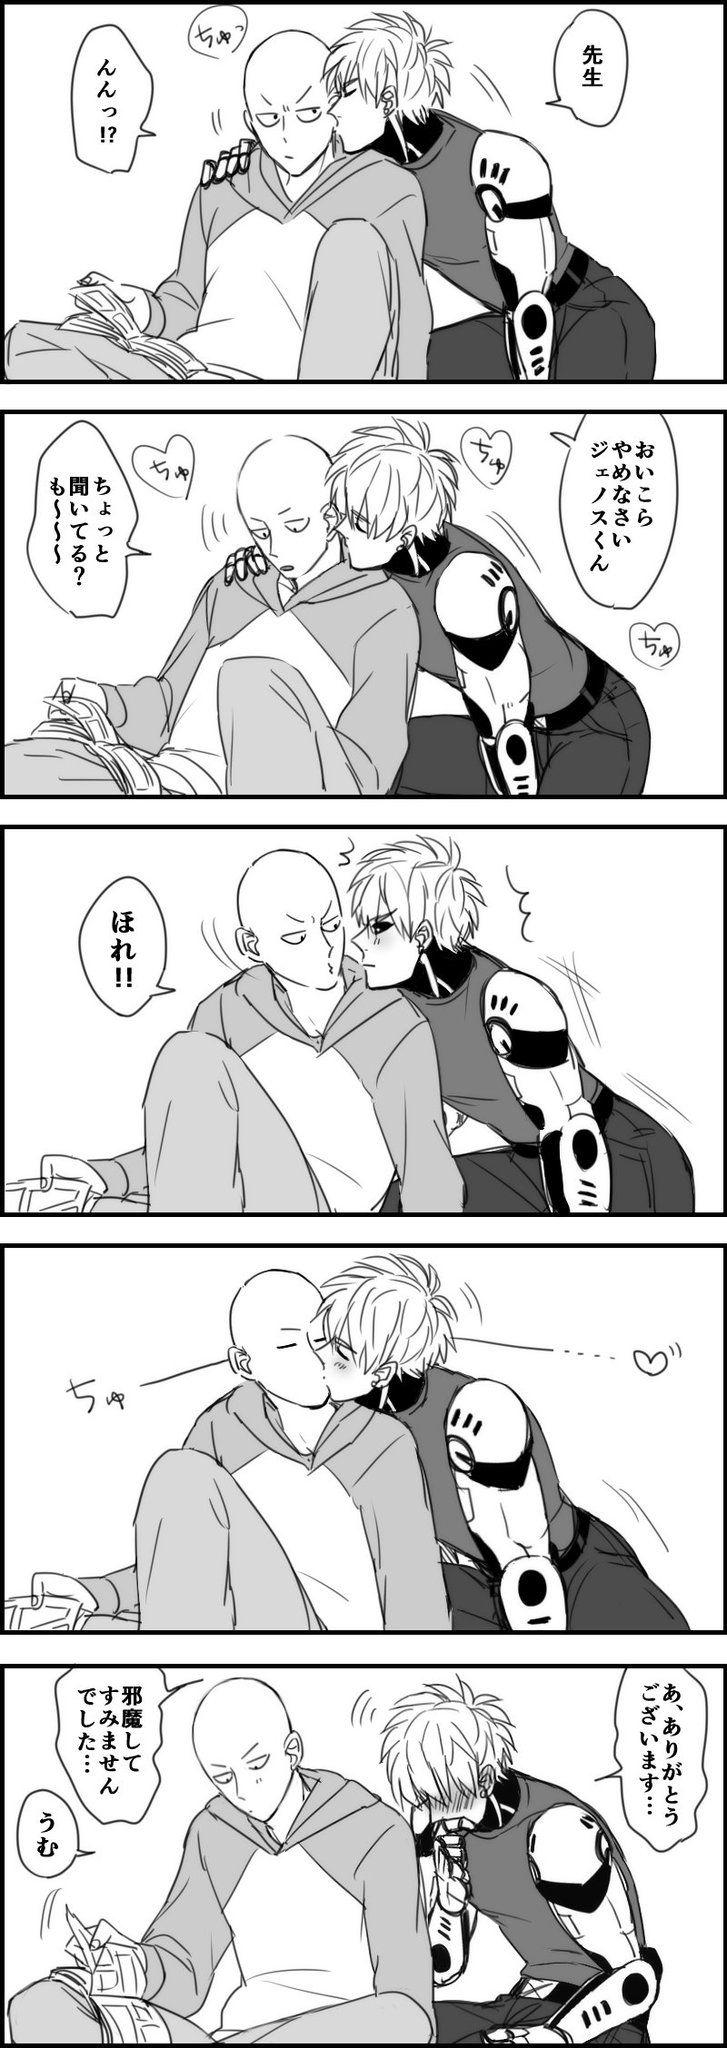 saitama and genos relationship